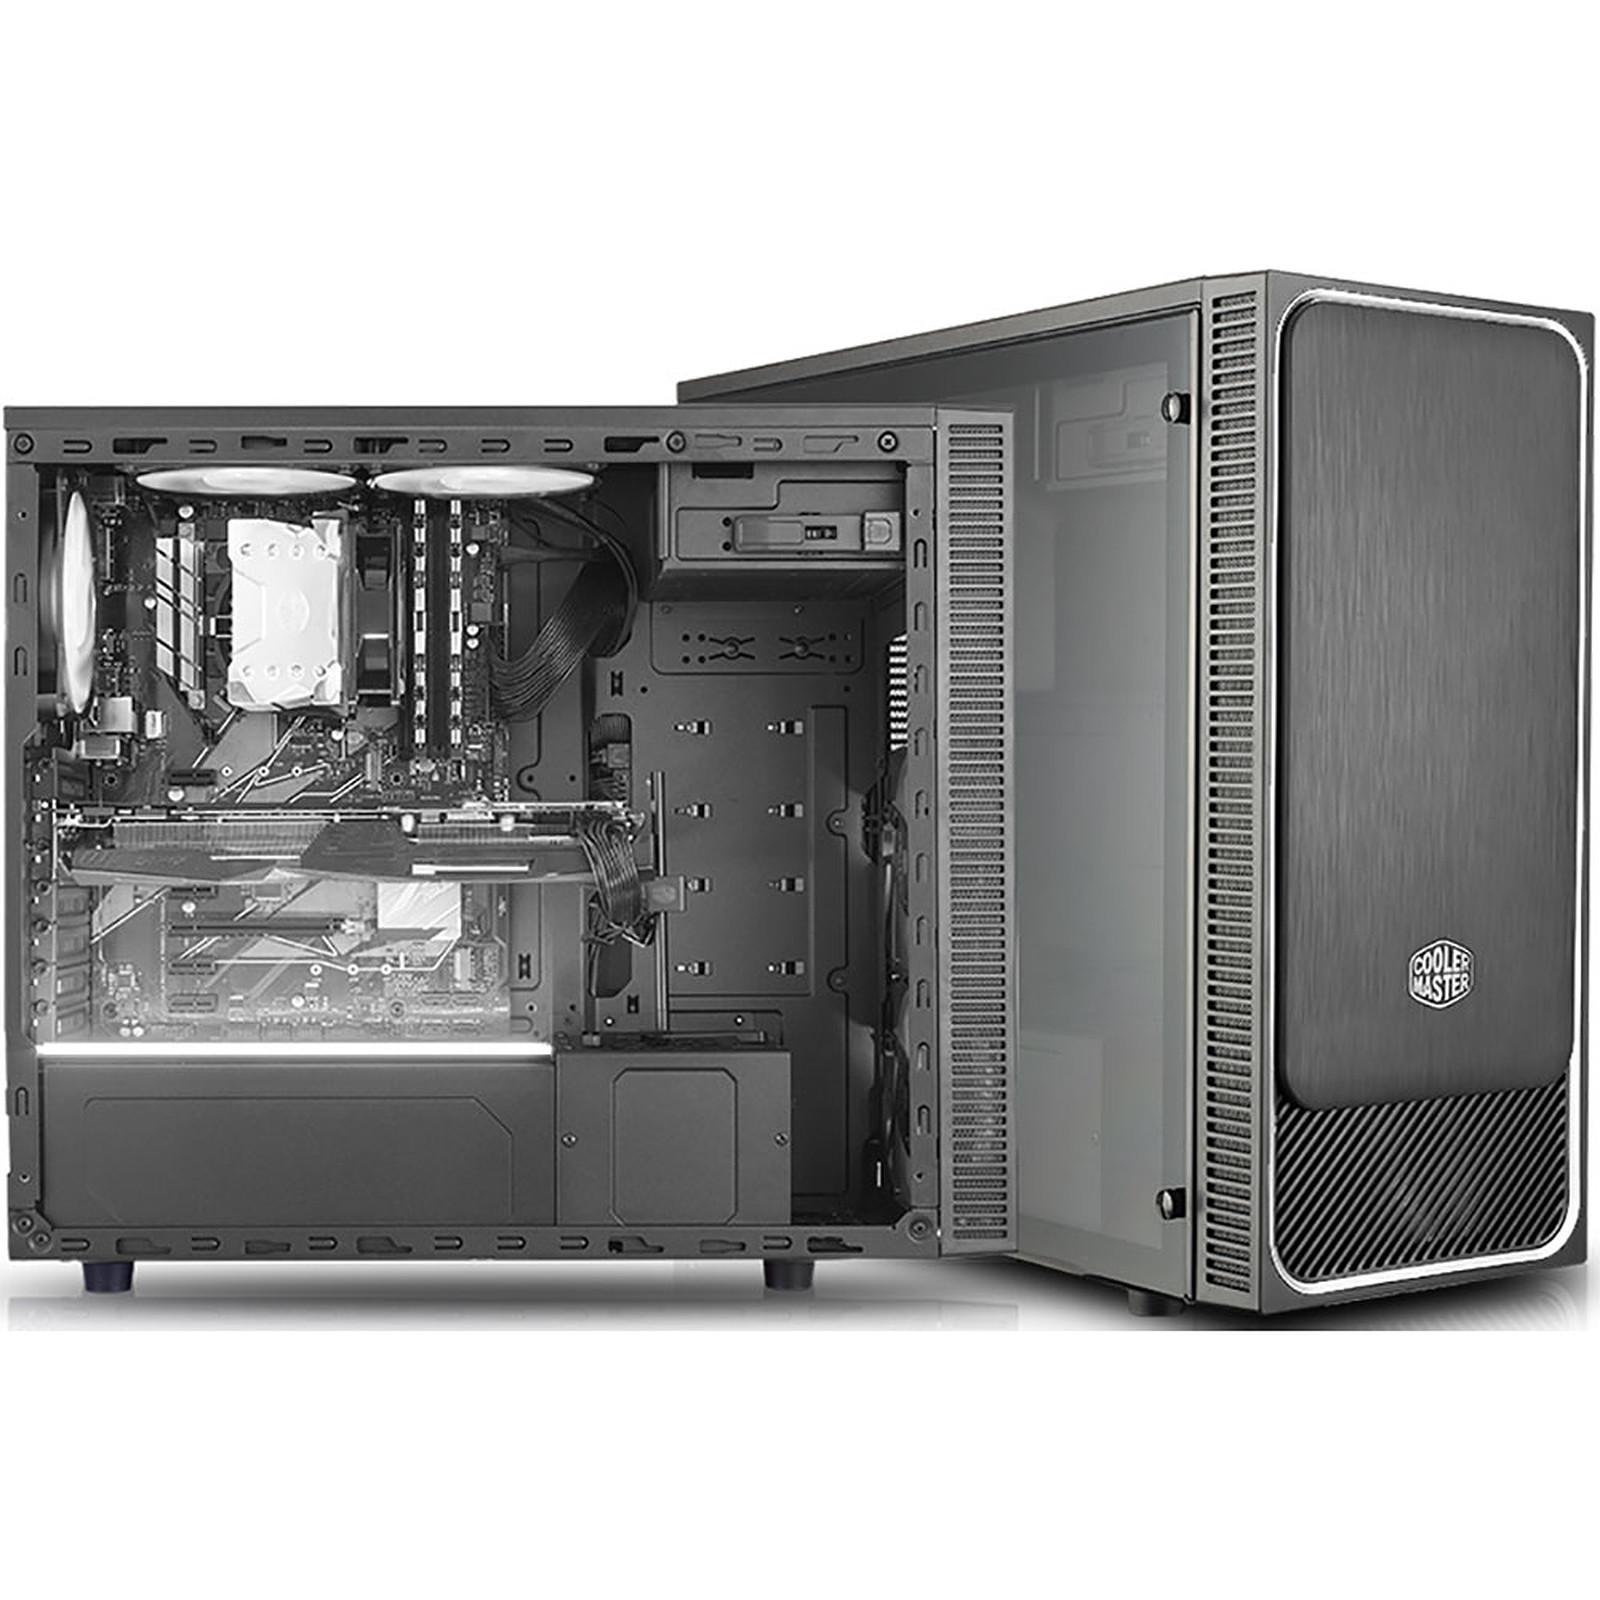 Cooler Master MasterBox E500L Windows Argent